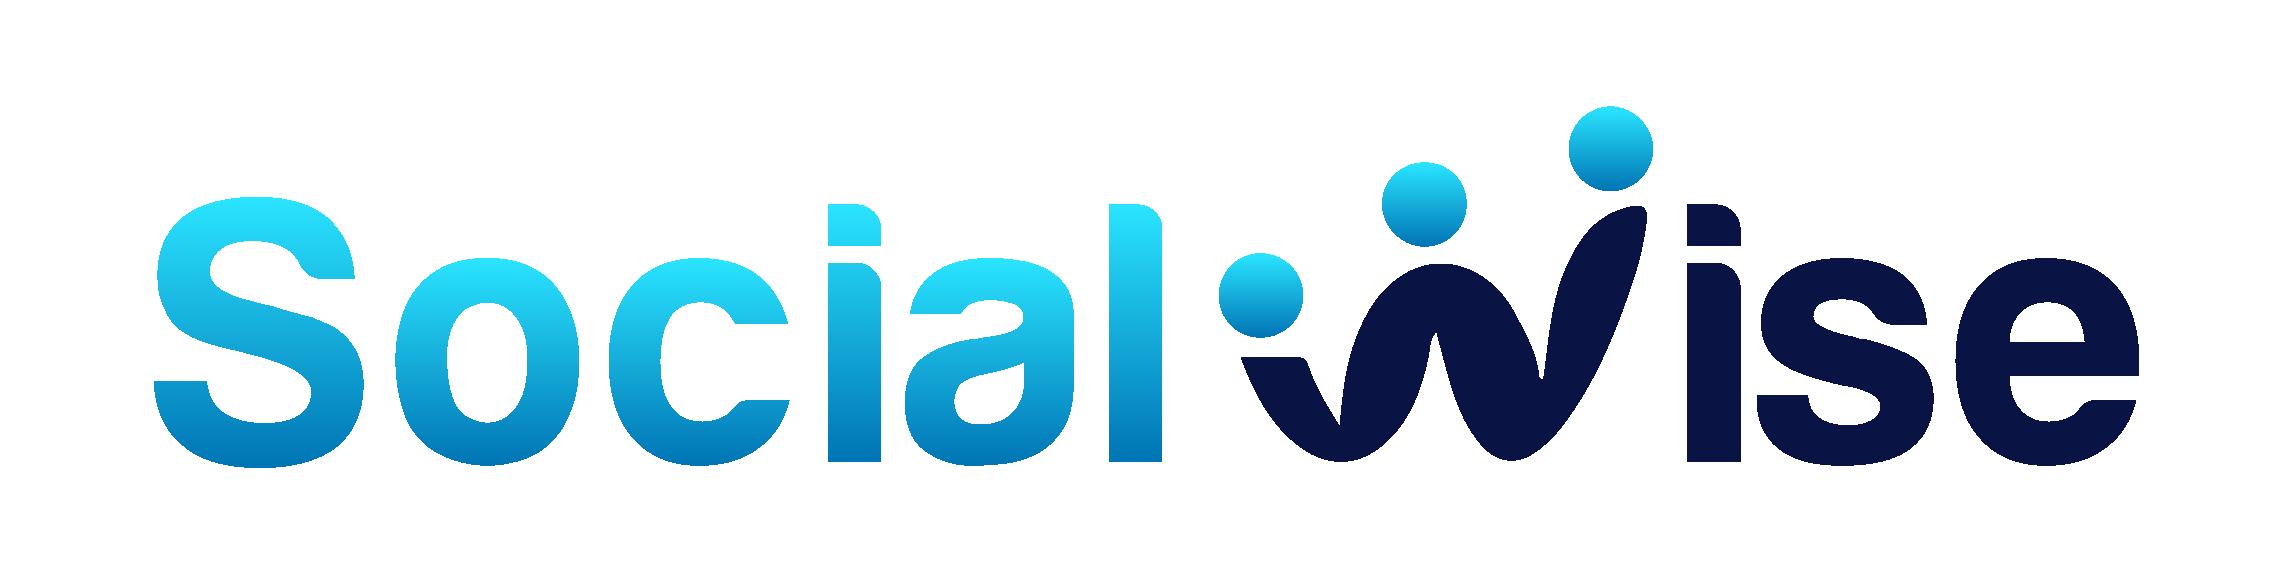 Social Wise logo